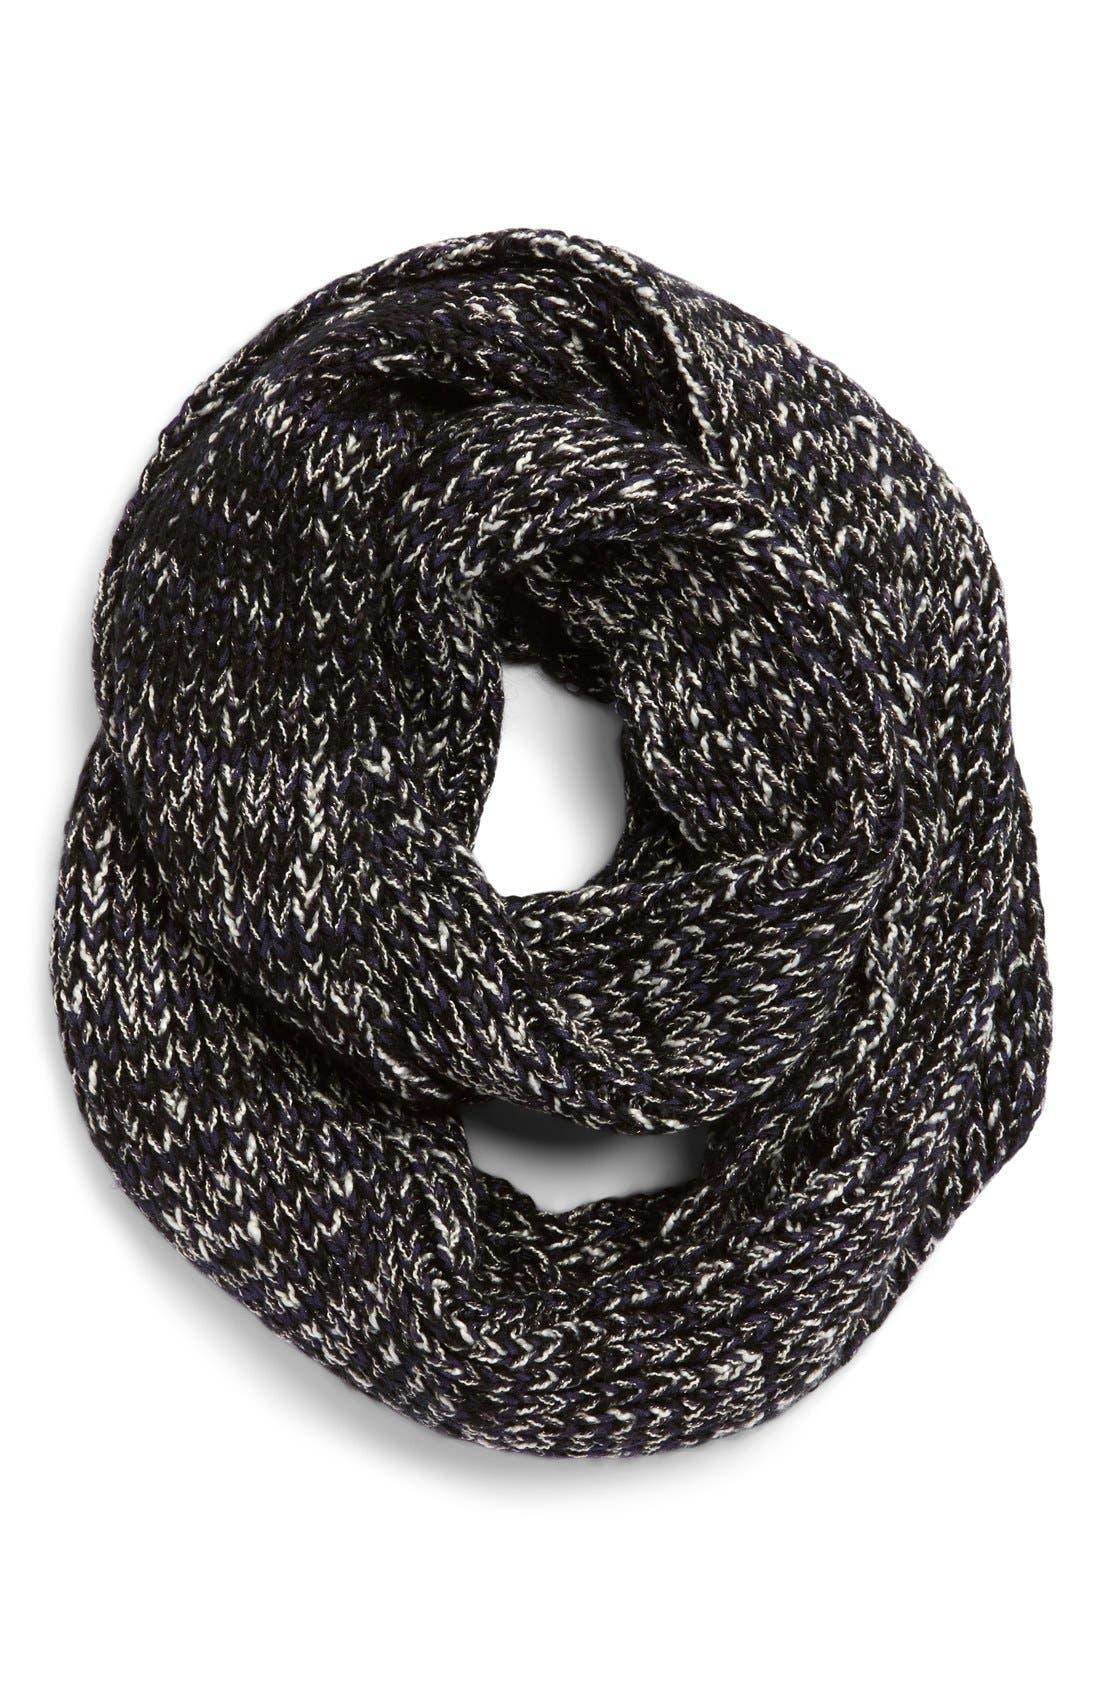 Alternate Image 1 Selected - Eugenia Kim 'Lane' Knit Infinity Scarf